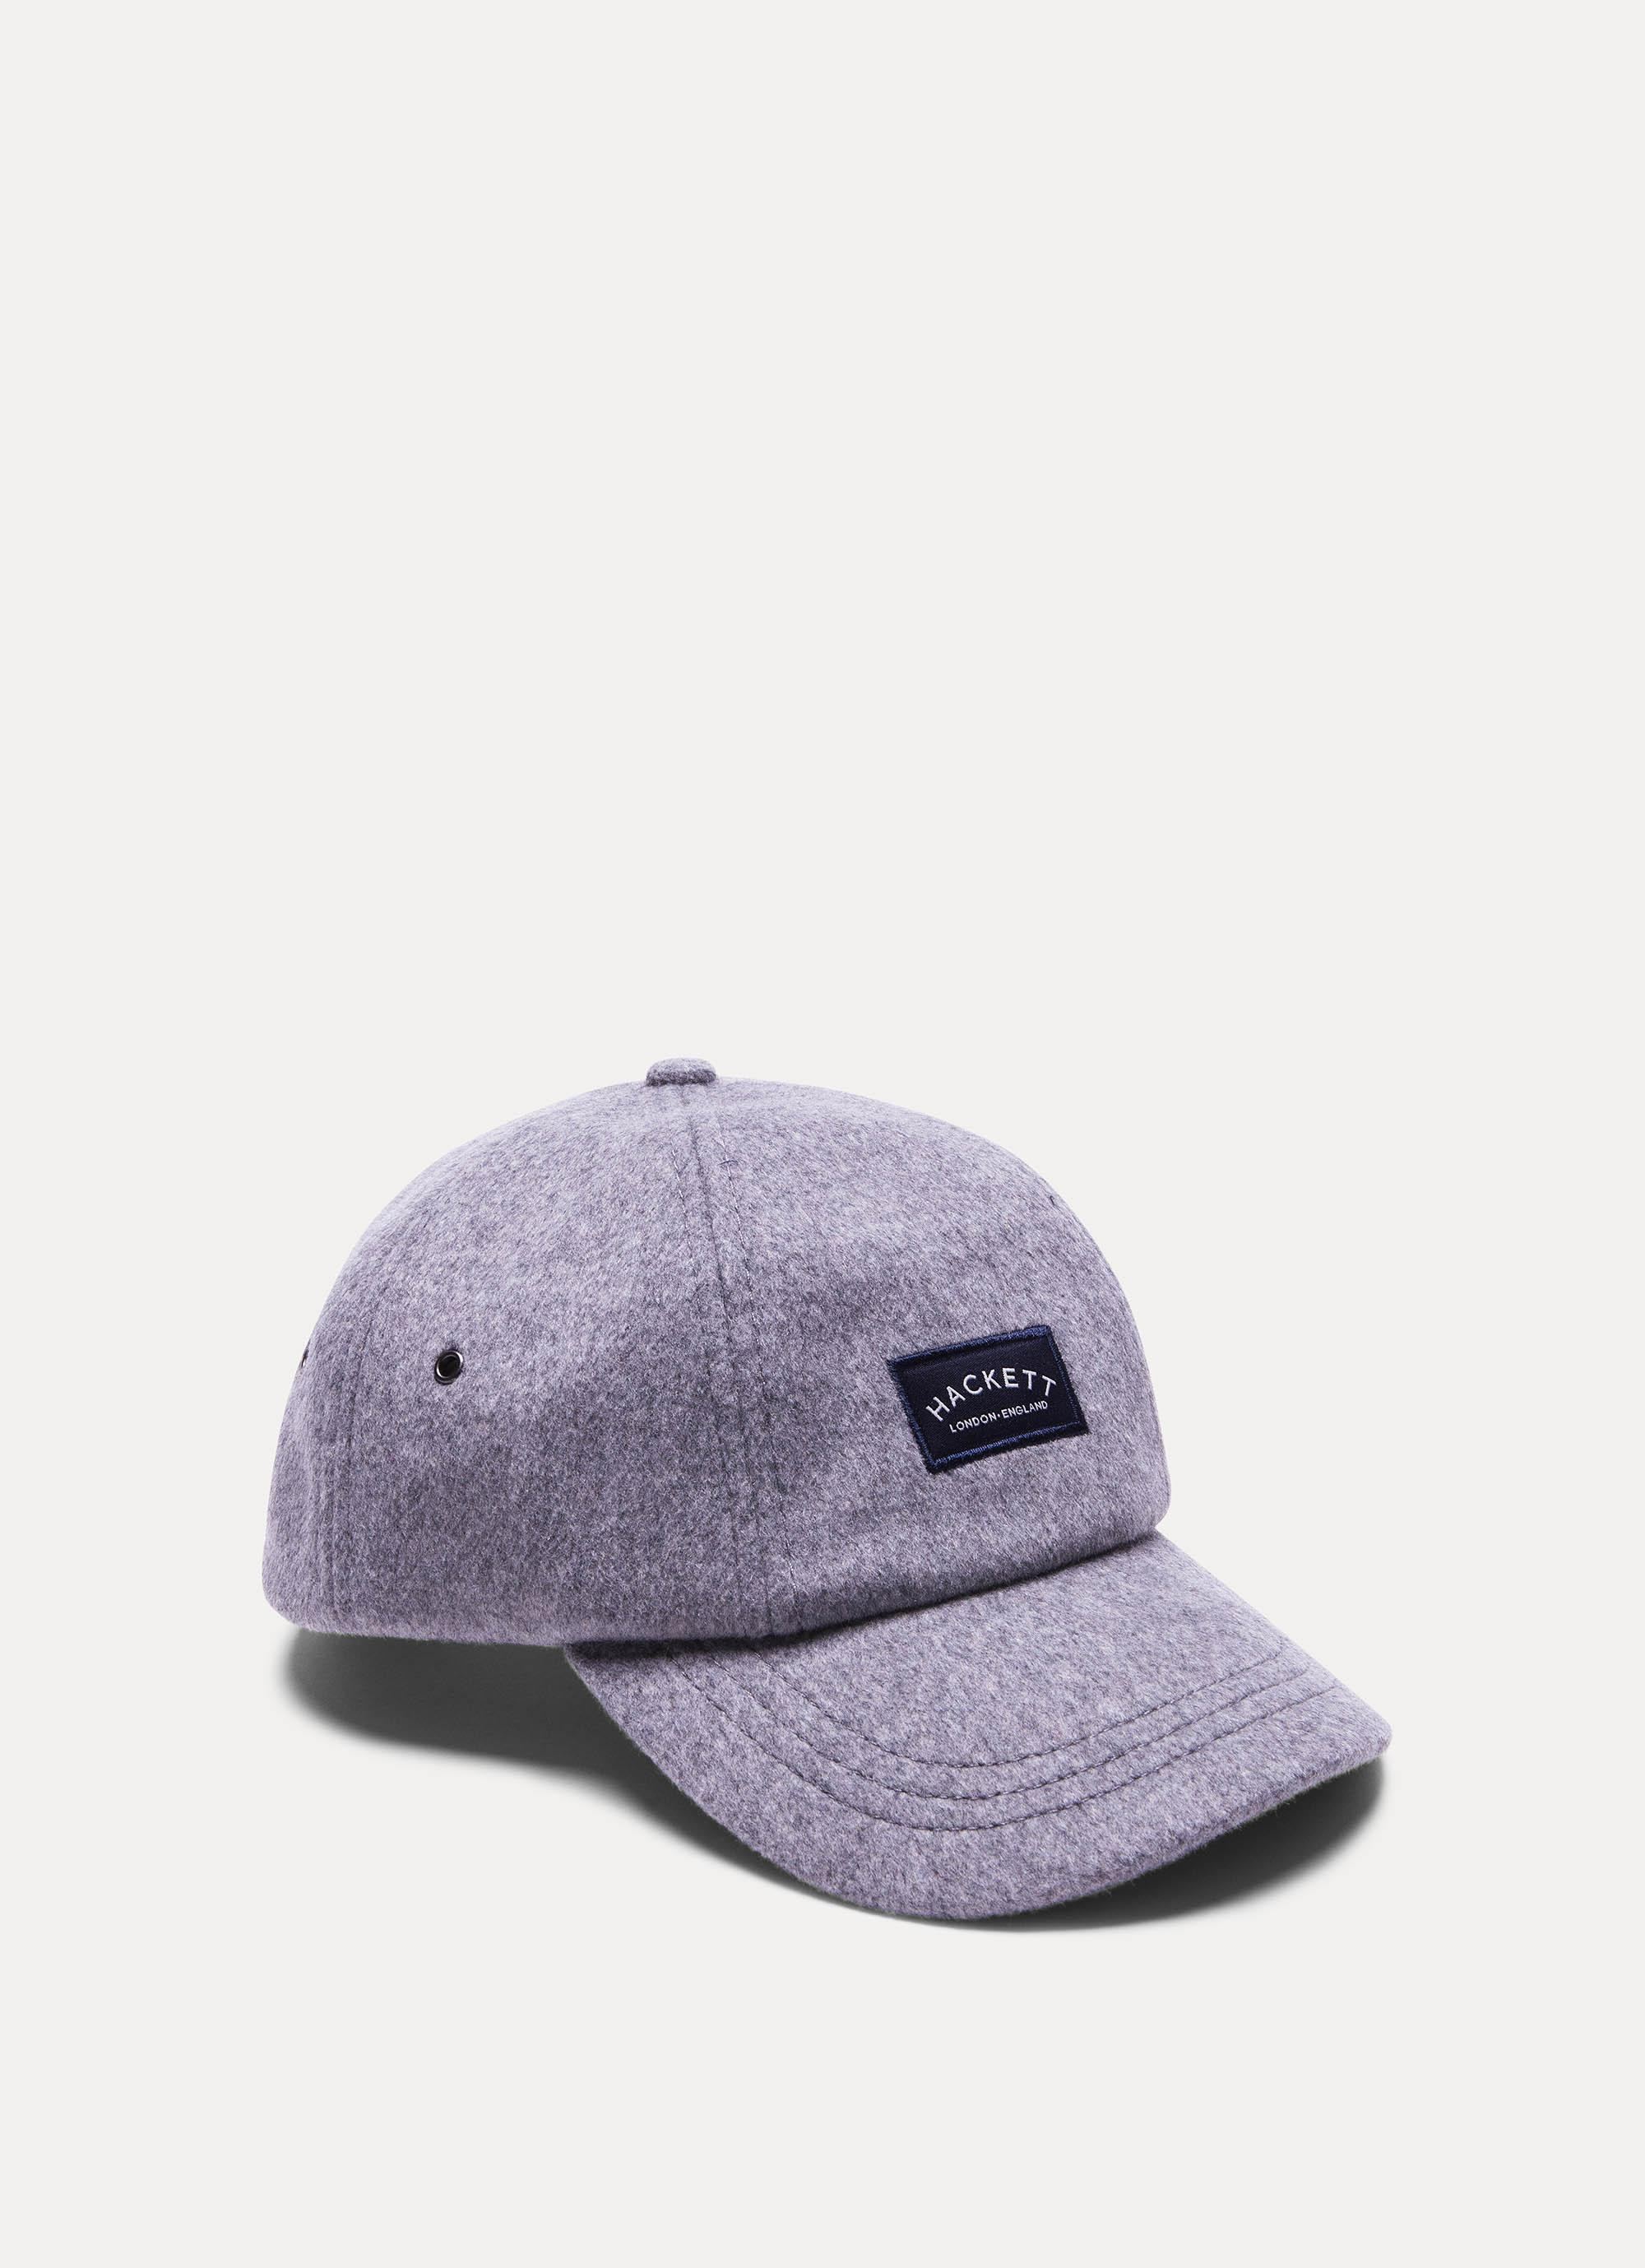 Hackett Logo Cotton Cap In Lt Grey